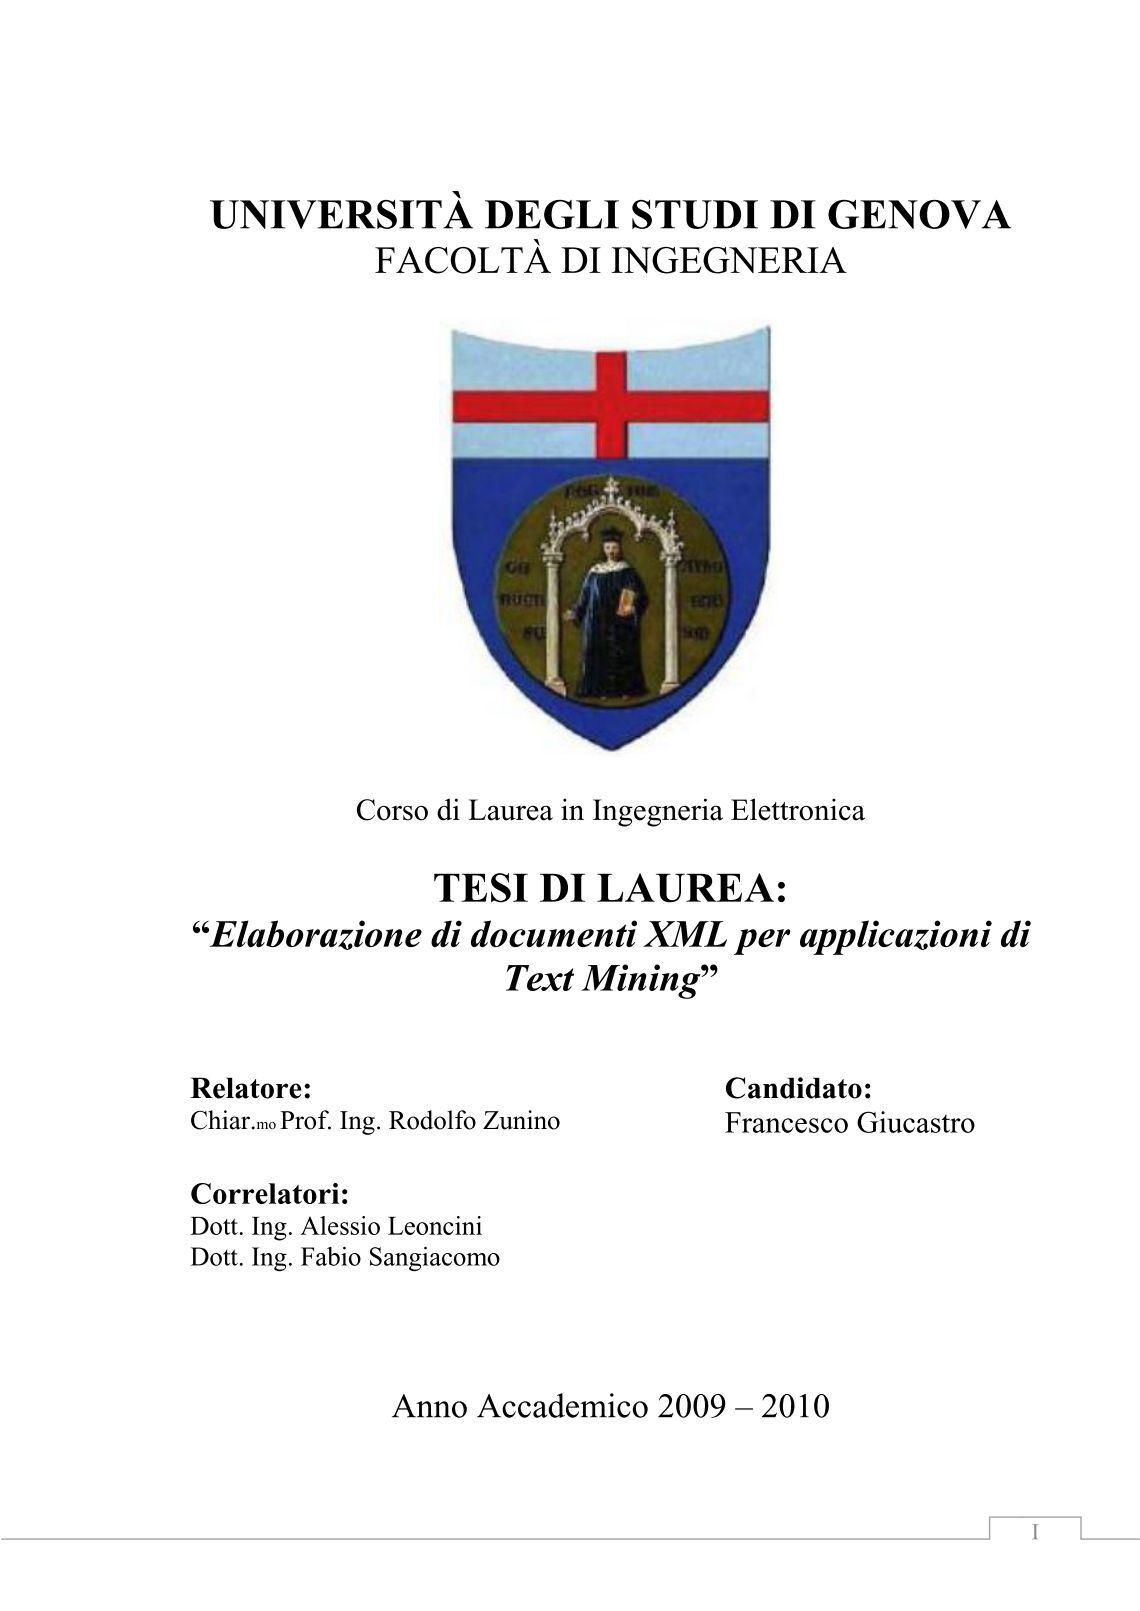 Unige Tasse Economia : Free magazines from elettronica unige